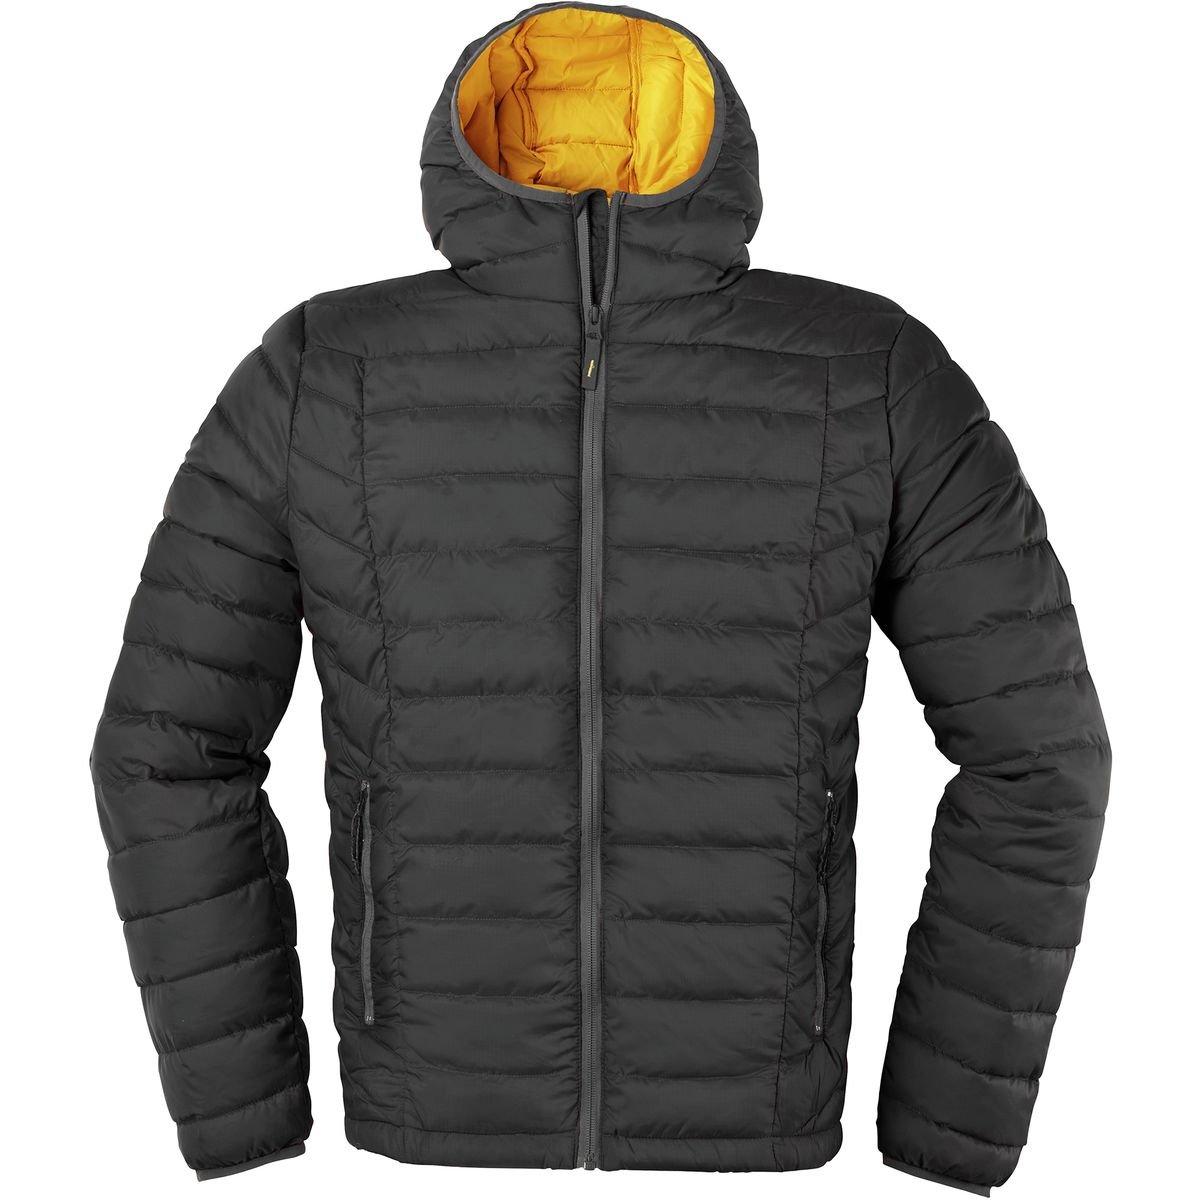 Sierra Designs Mens Tioga Winter Insulated Puffer Coat